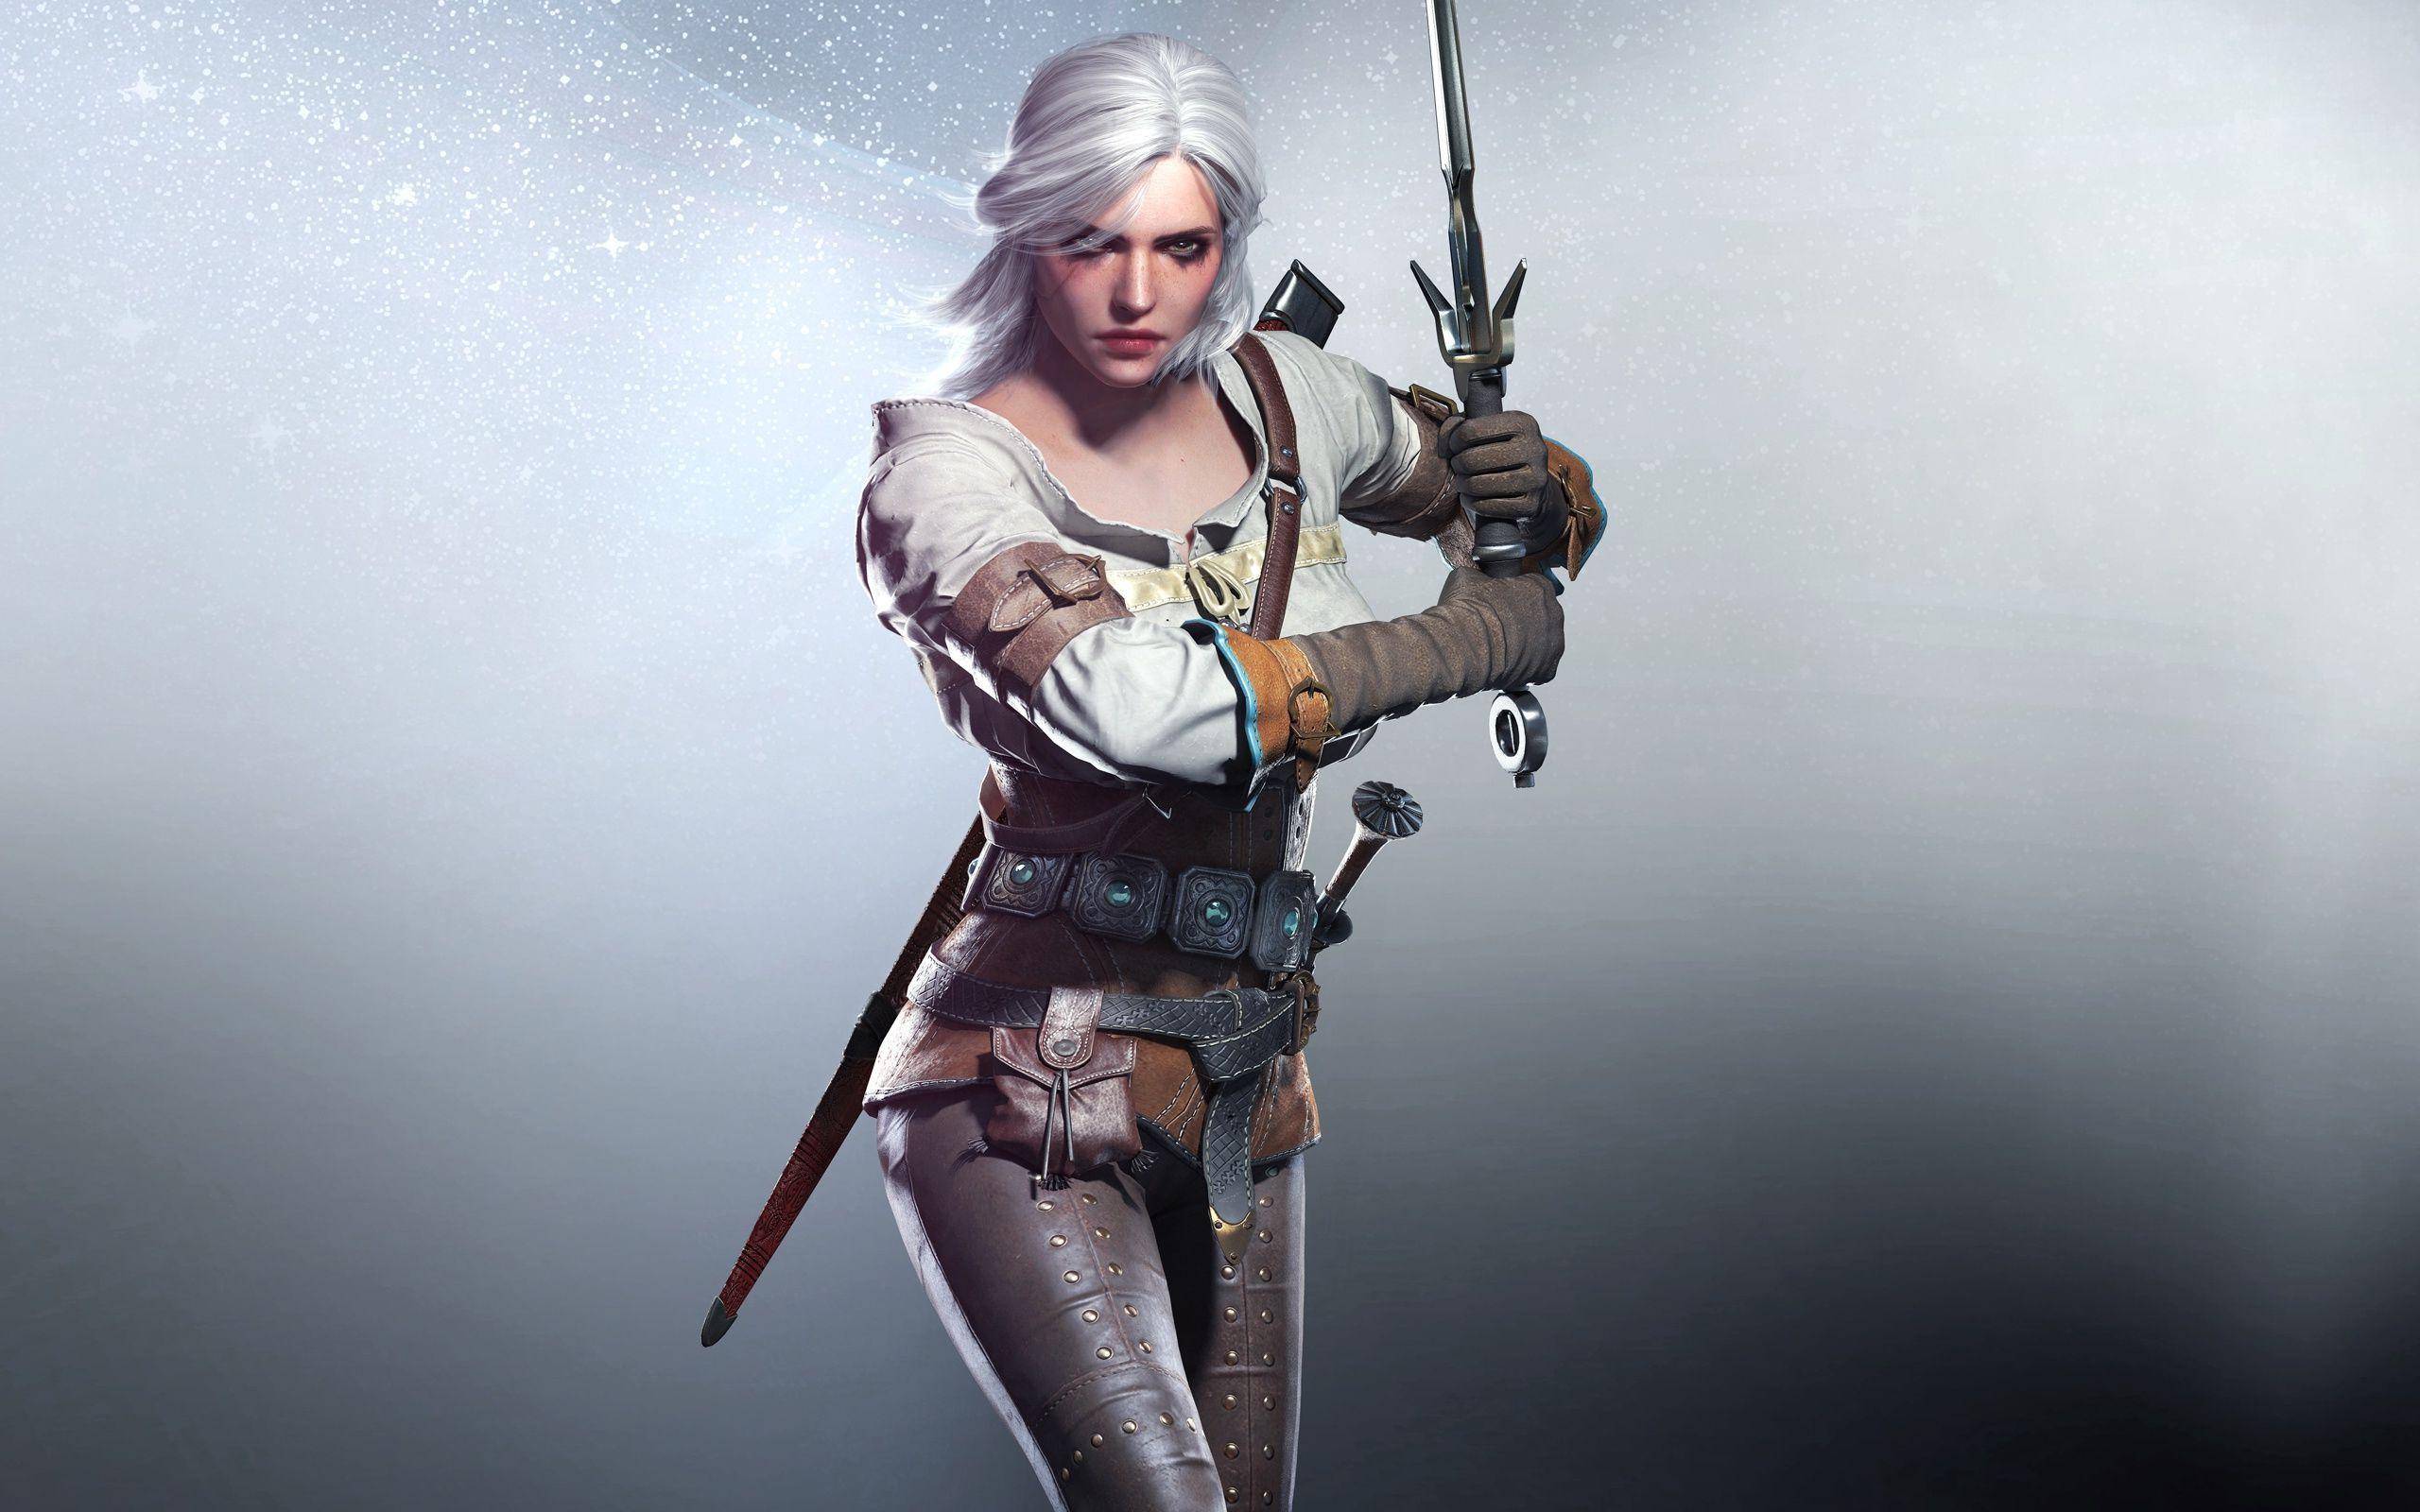 2560x1600 Ciri In The Witcher 3 Wild Hunt Games Wallpaper 2560x1600